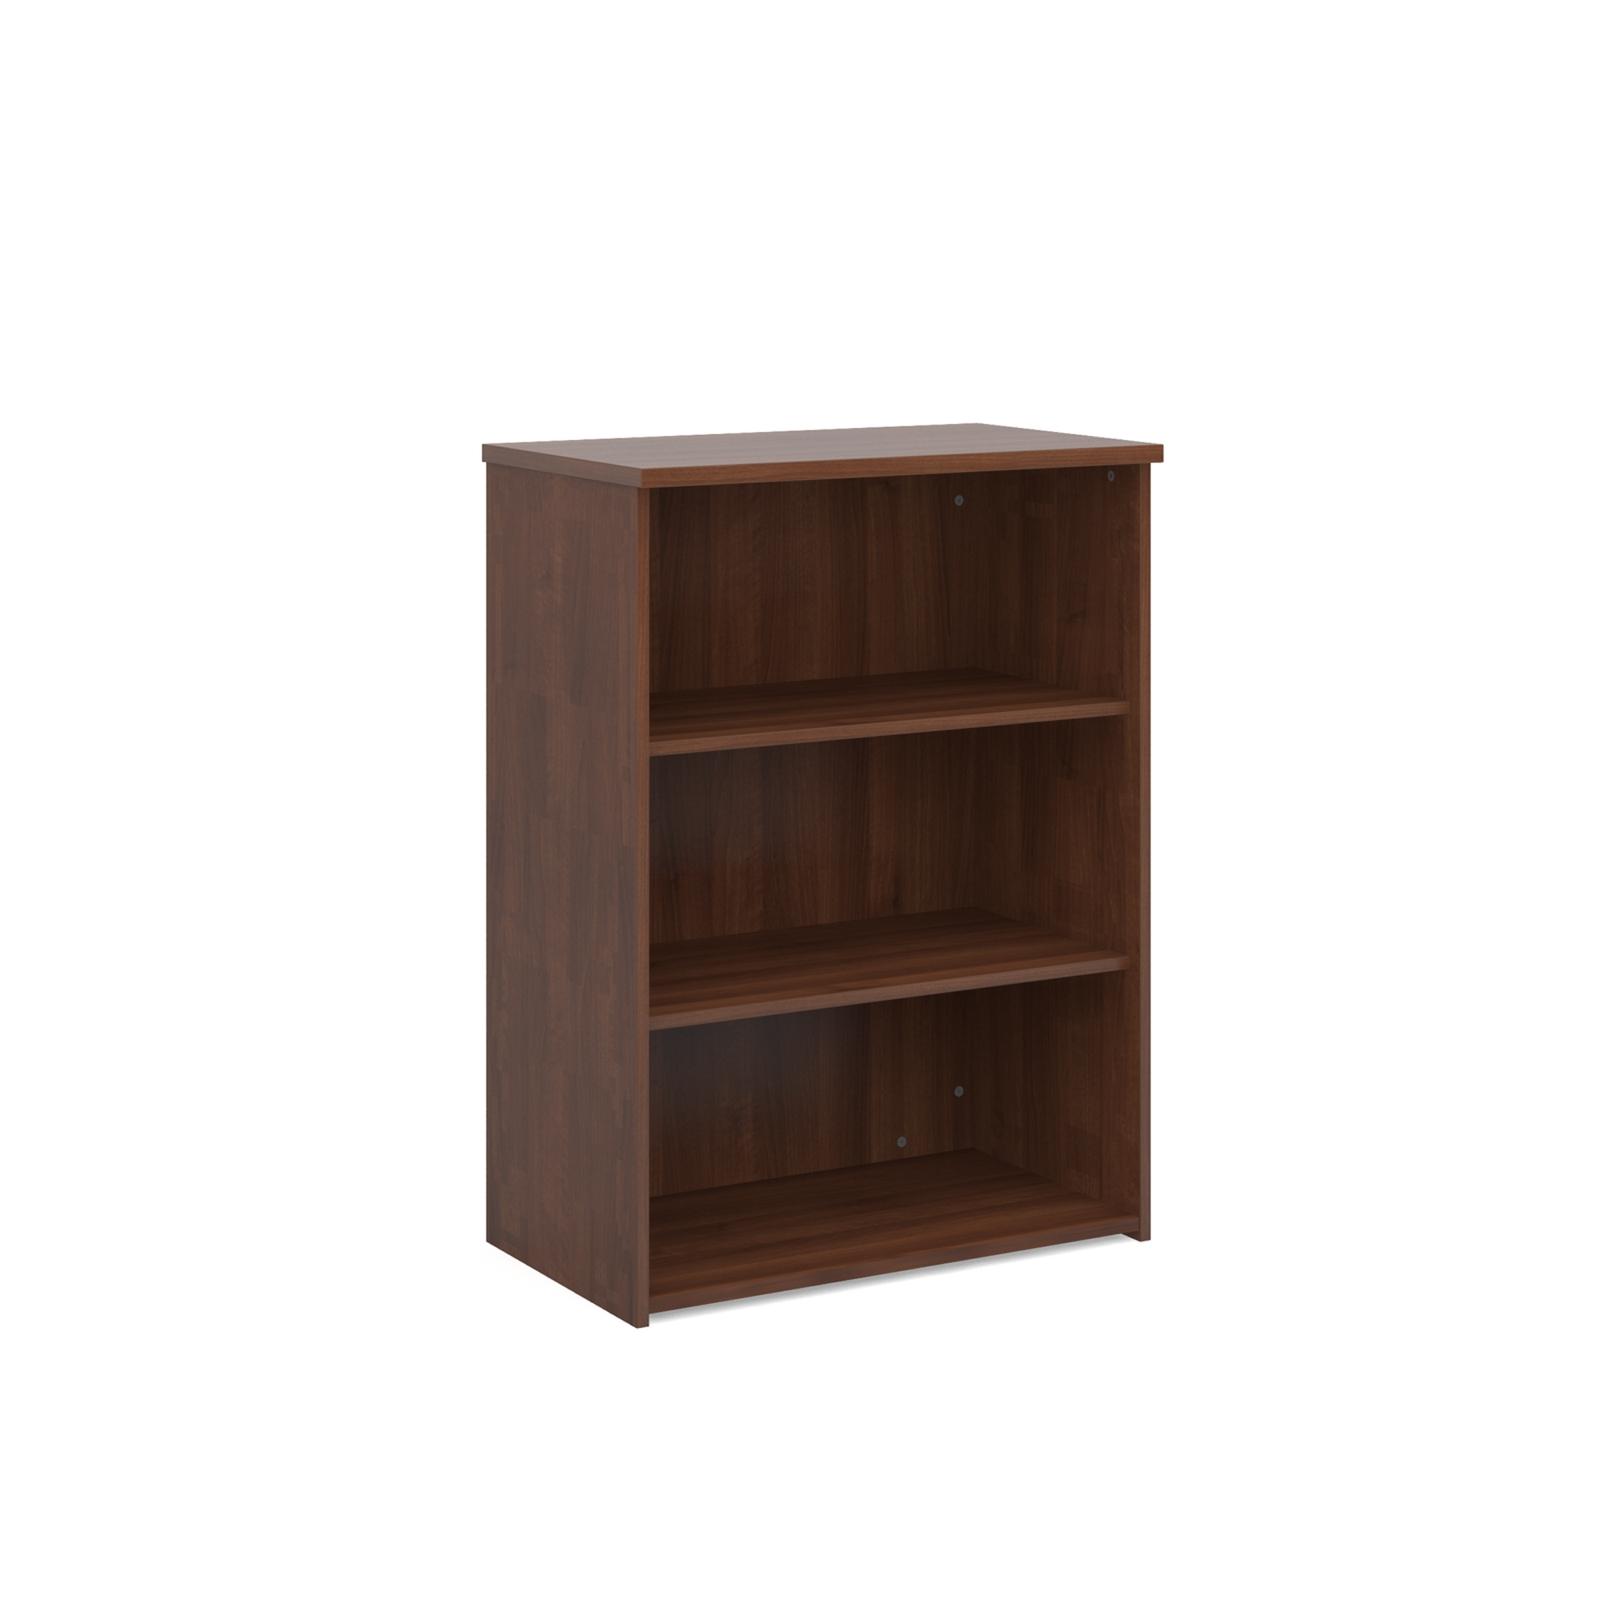 Walnut Bookcase H1090mm